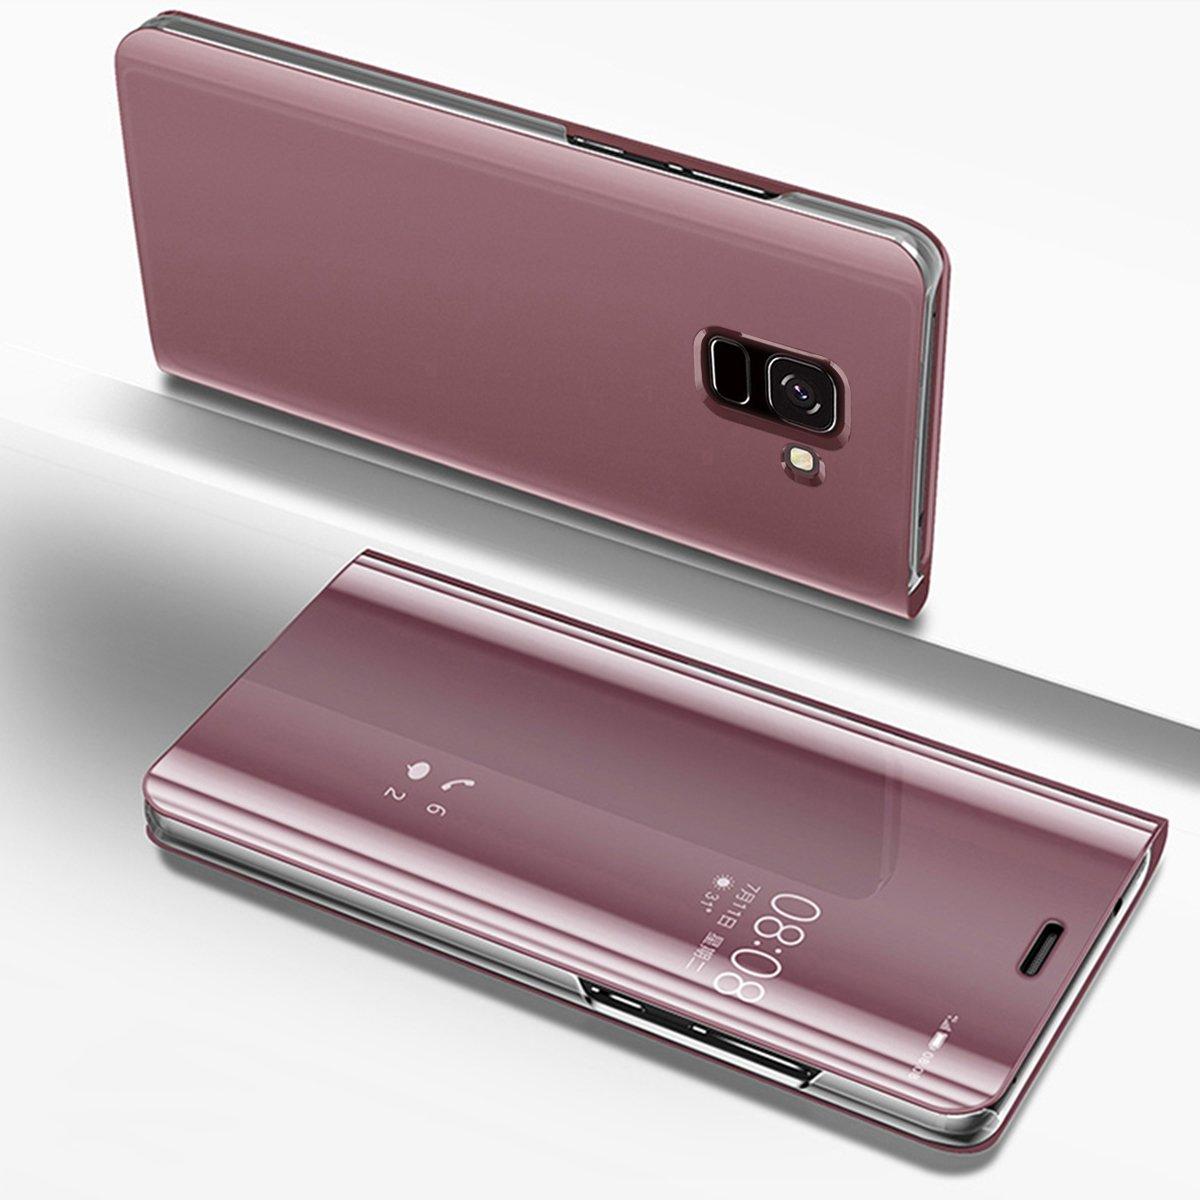 PHEZEN Galaxy J6 2018 Case,Luxury Mirror Makeup Case Plating PU Leather Flip Folio Wallet Case [Kickstand] Magnetic Closure Full Cover Case for Samsung Galaxy J6 2018 (Rose Gold)